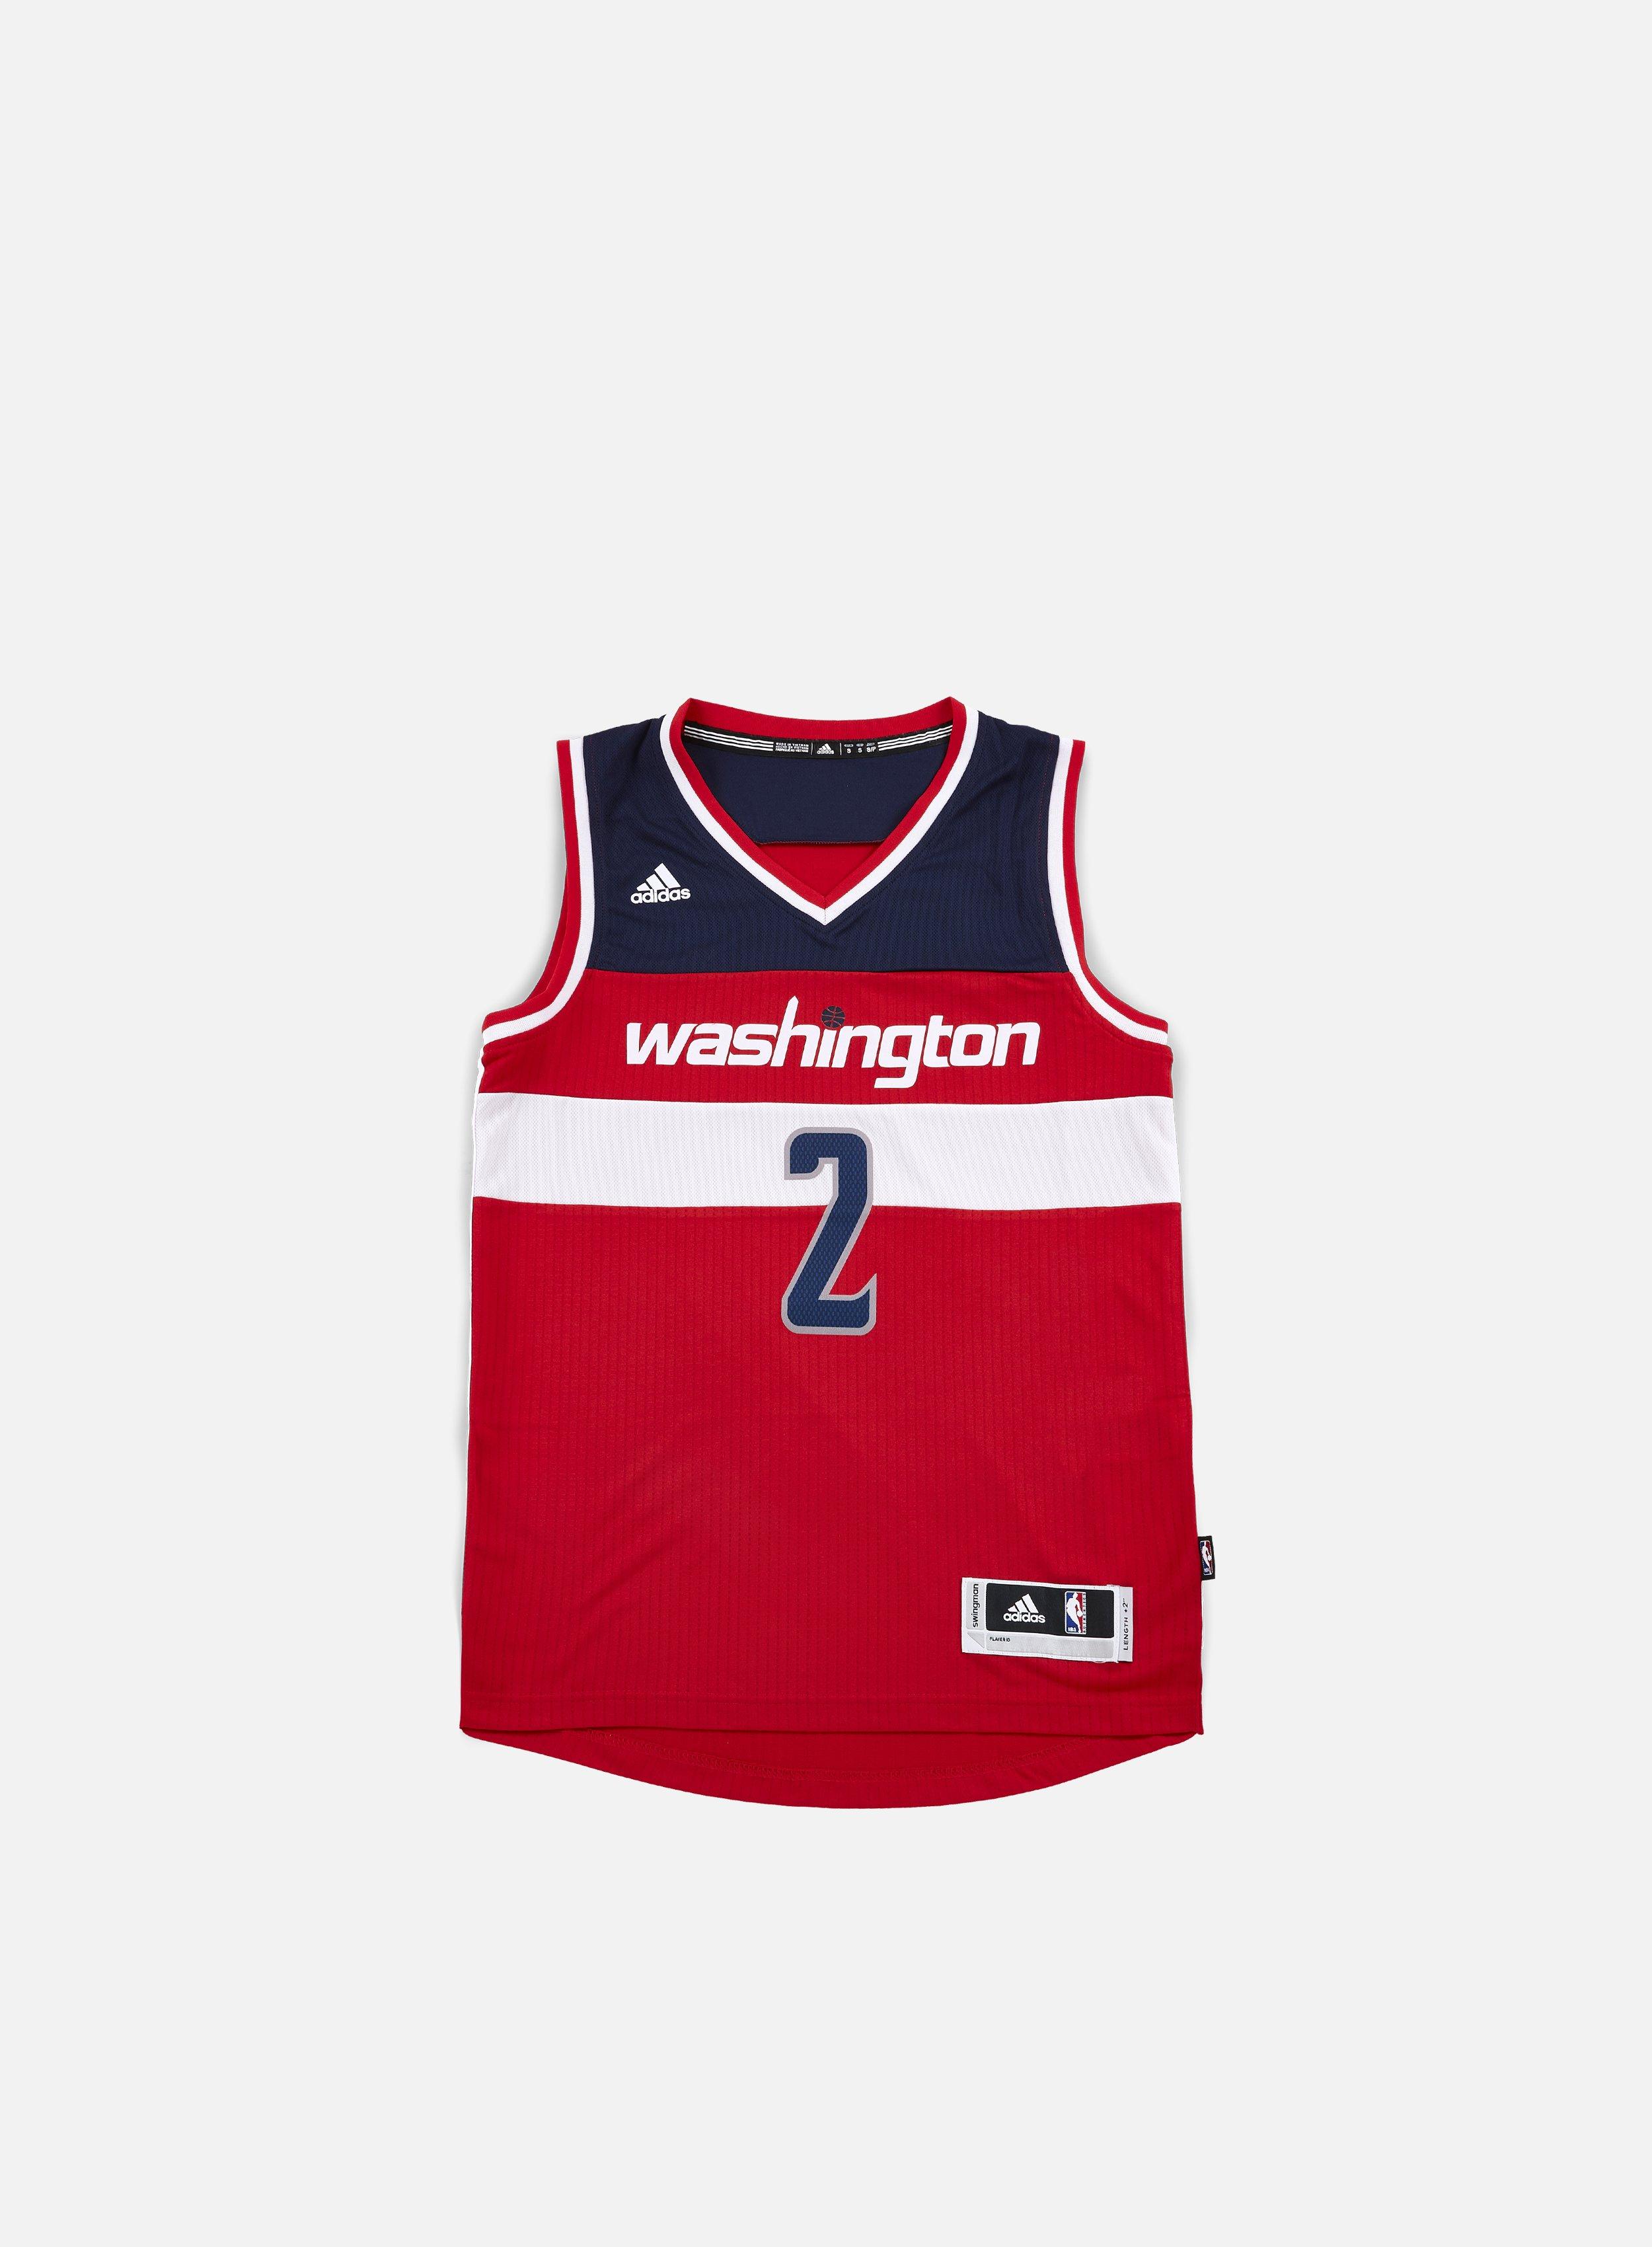 Washington Wizards Swingman Jersey John Wall